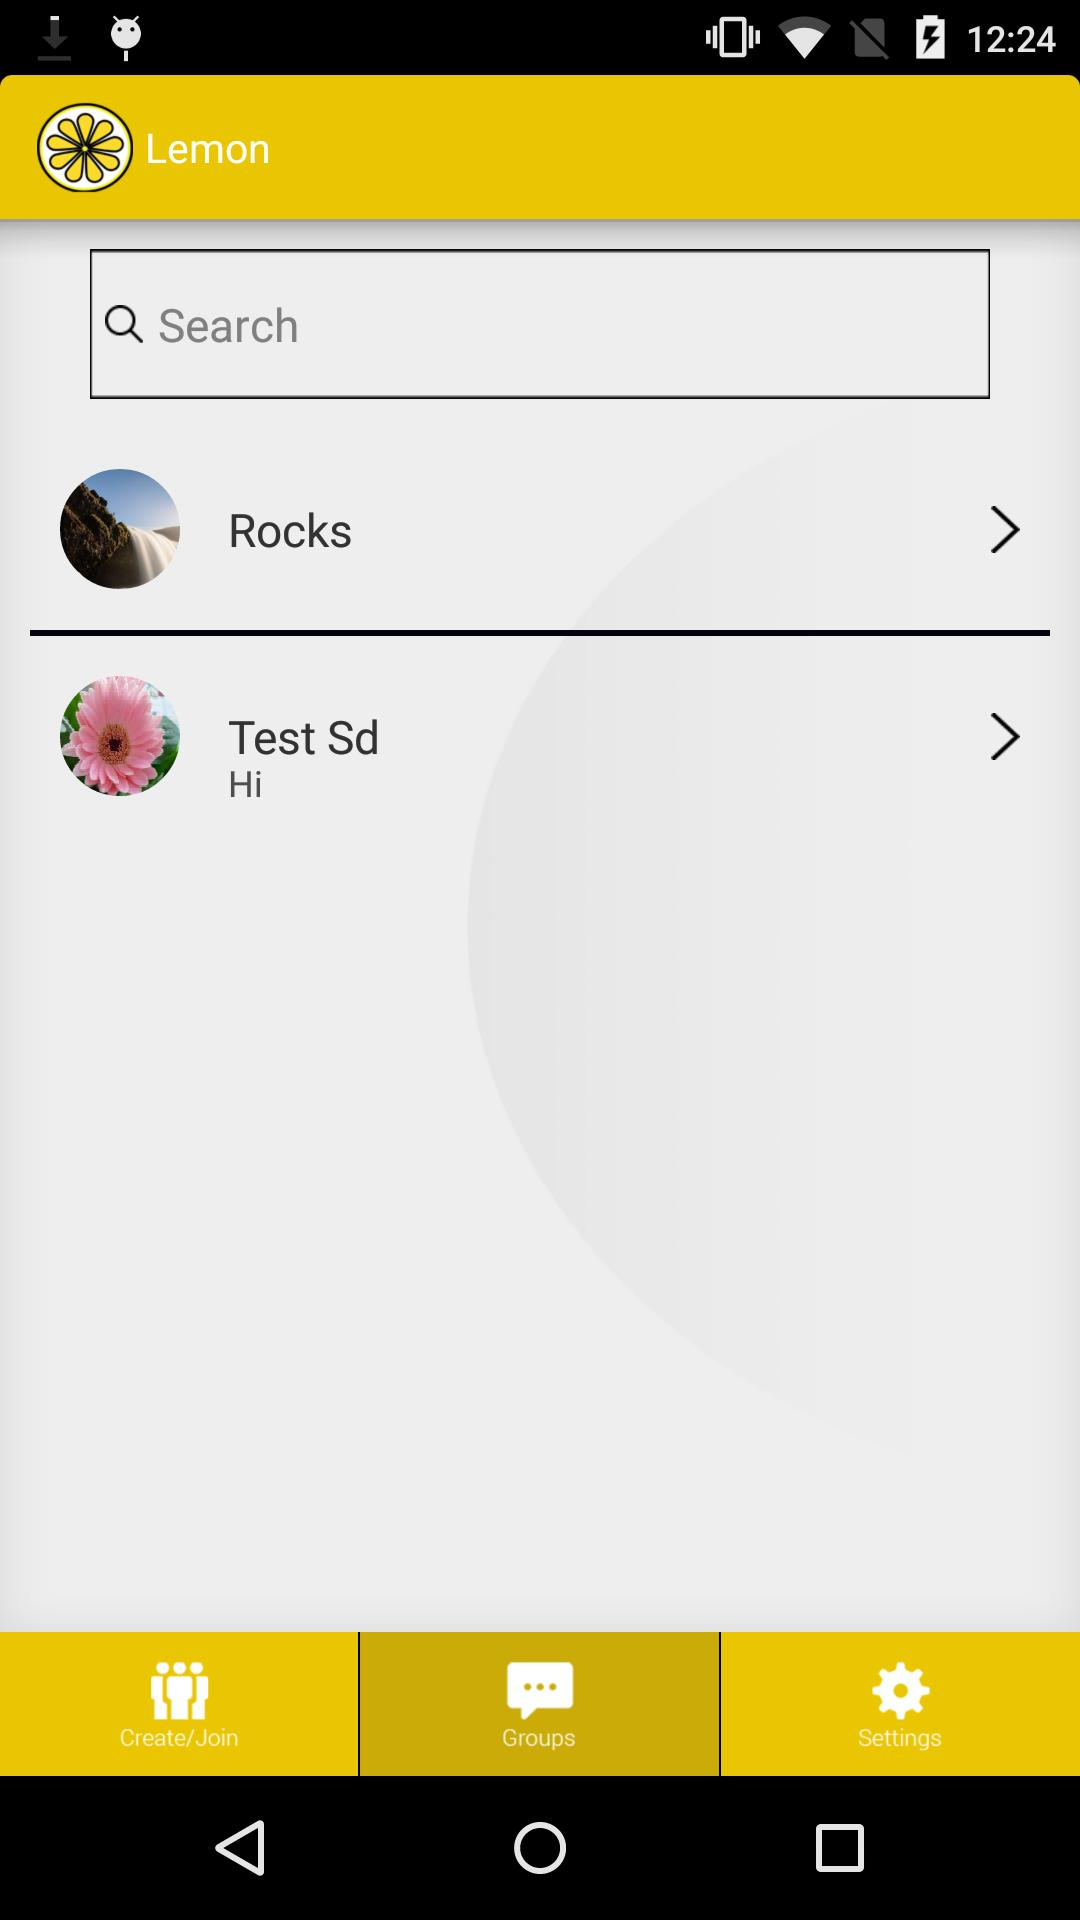 Lemon Group Messenger for Android - APK Download